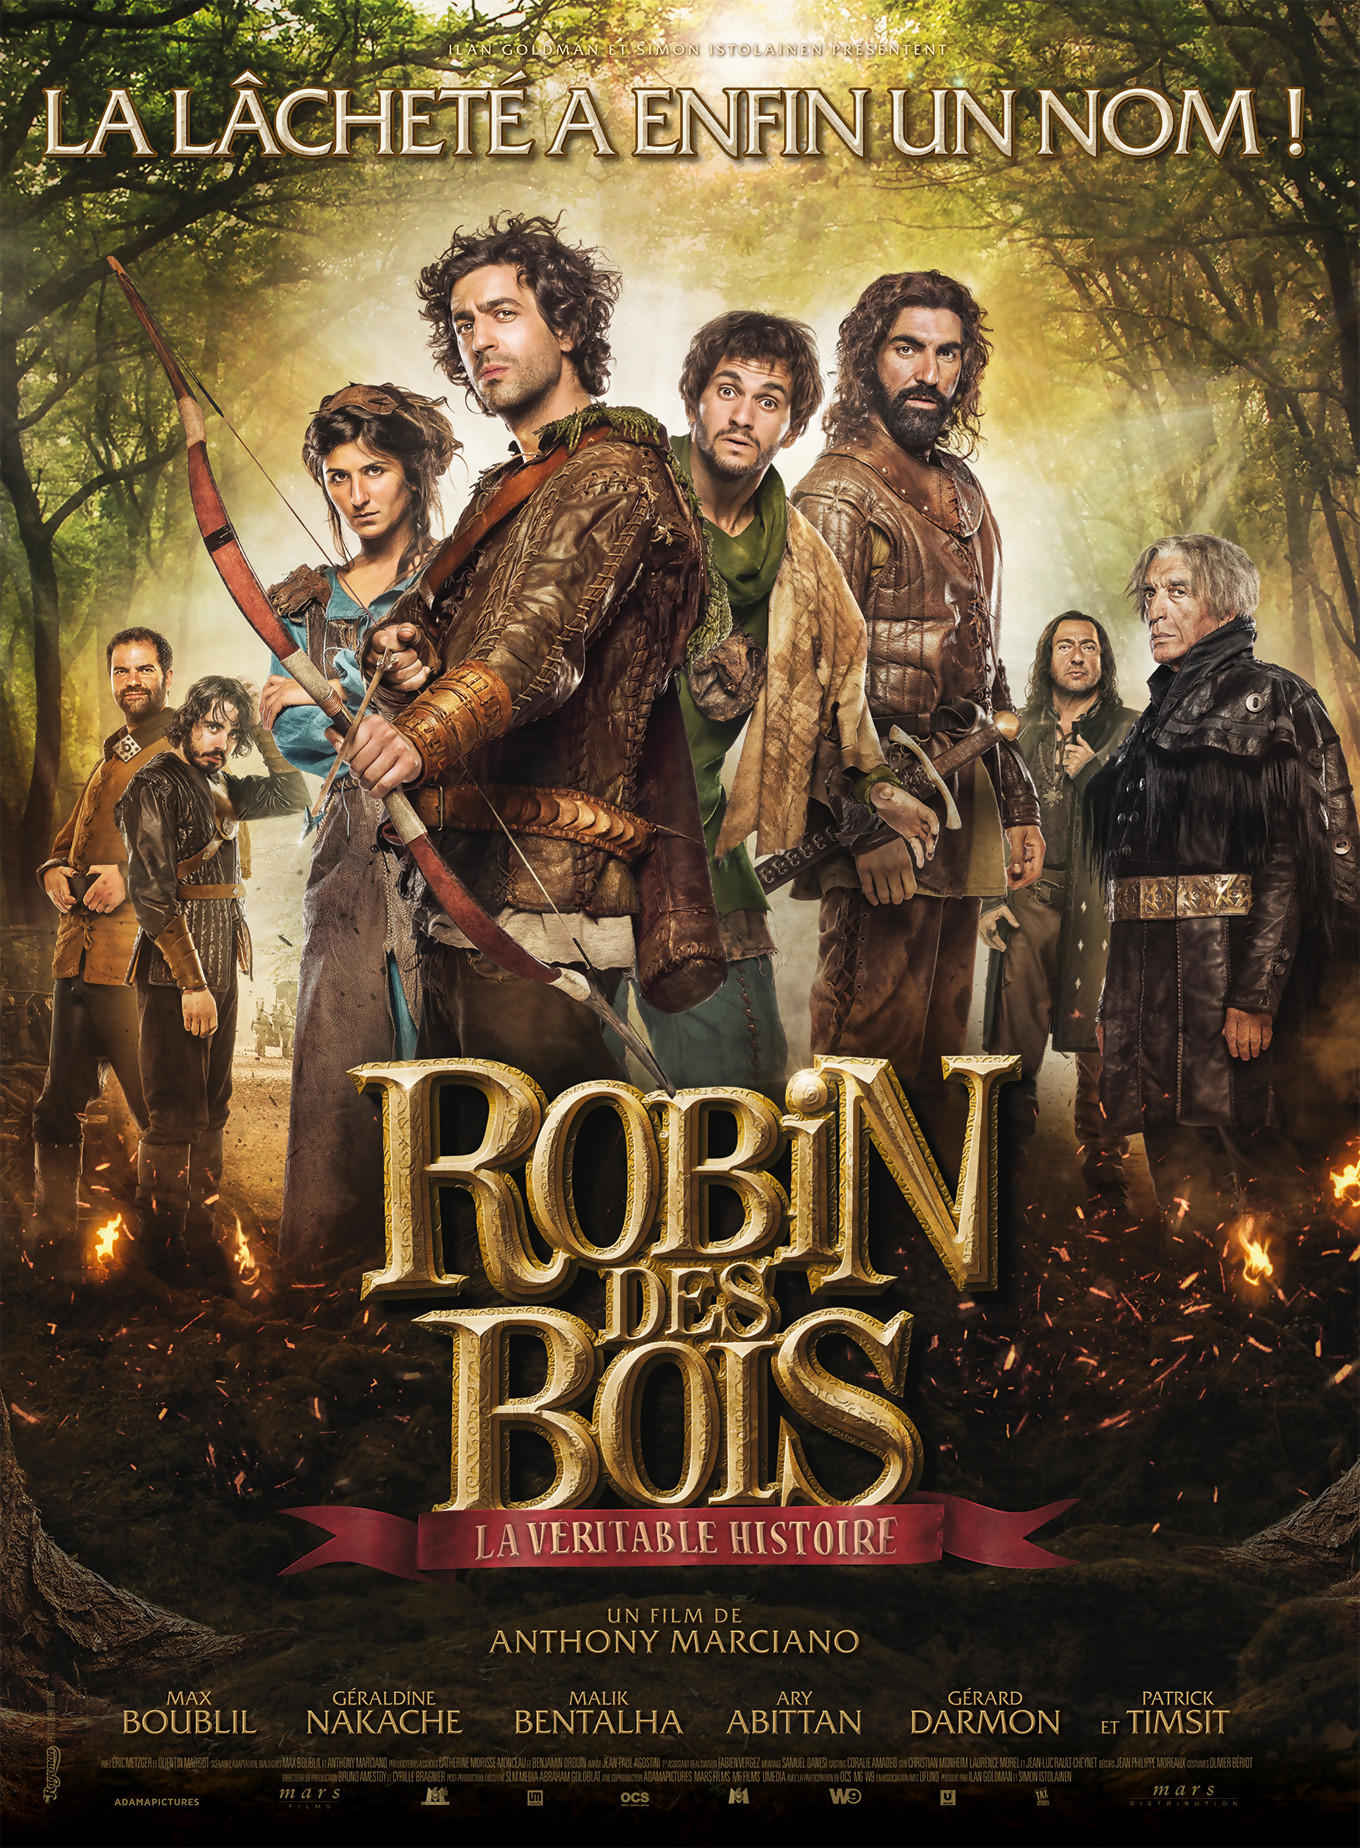 Robin des bois la v ritable histoire 2015 for Avis maison compere